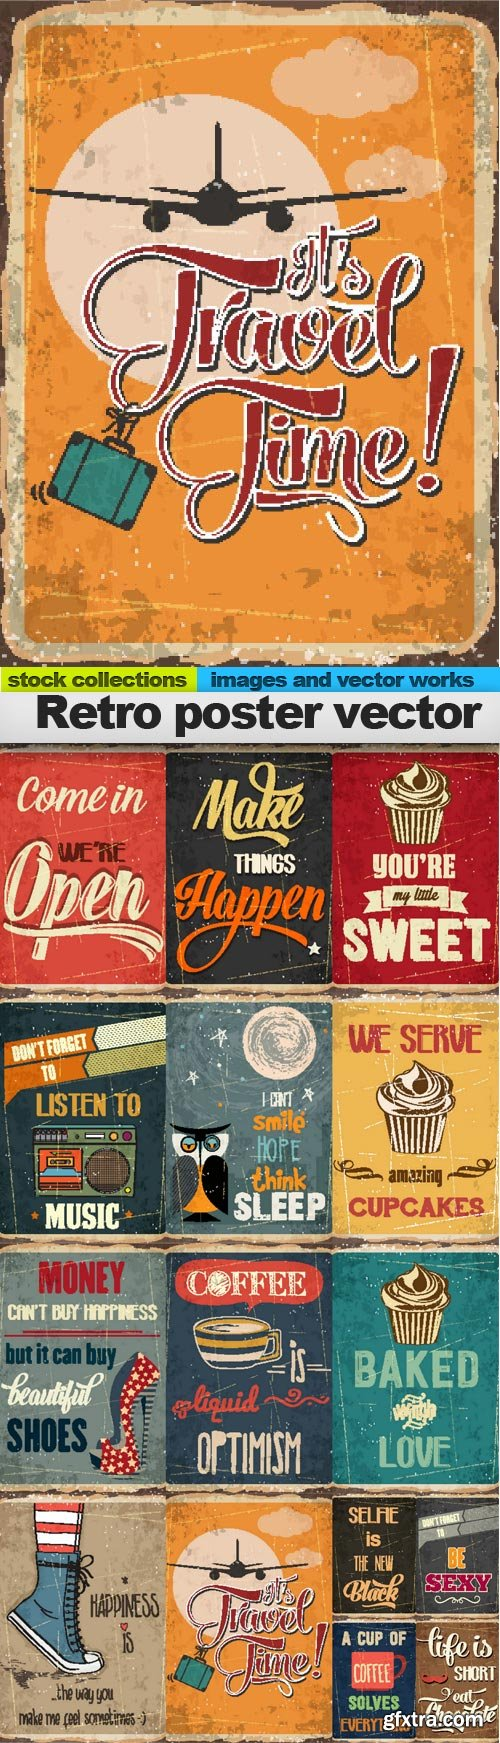 Retro poster vector, 15 x EPS